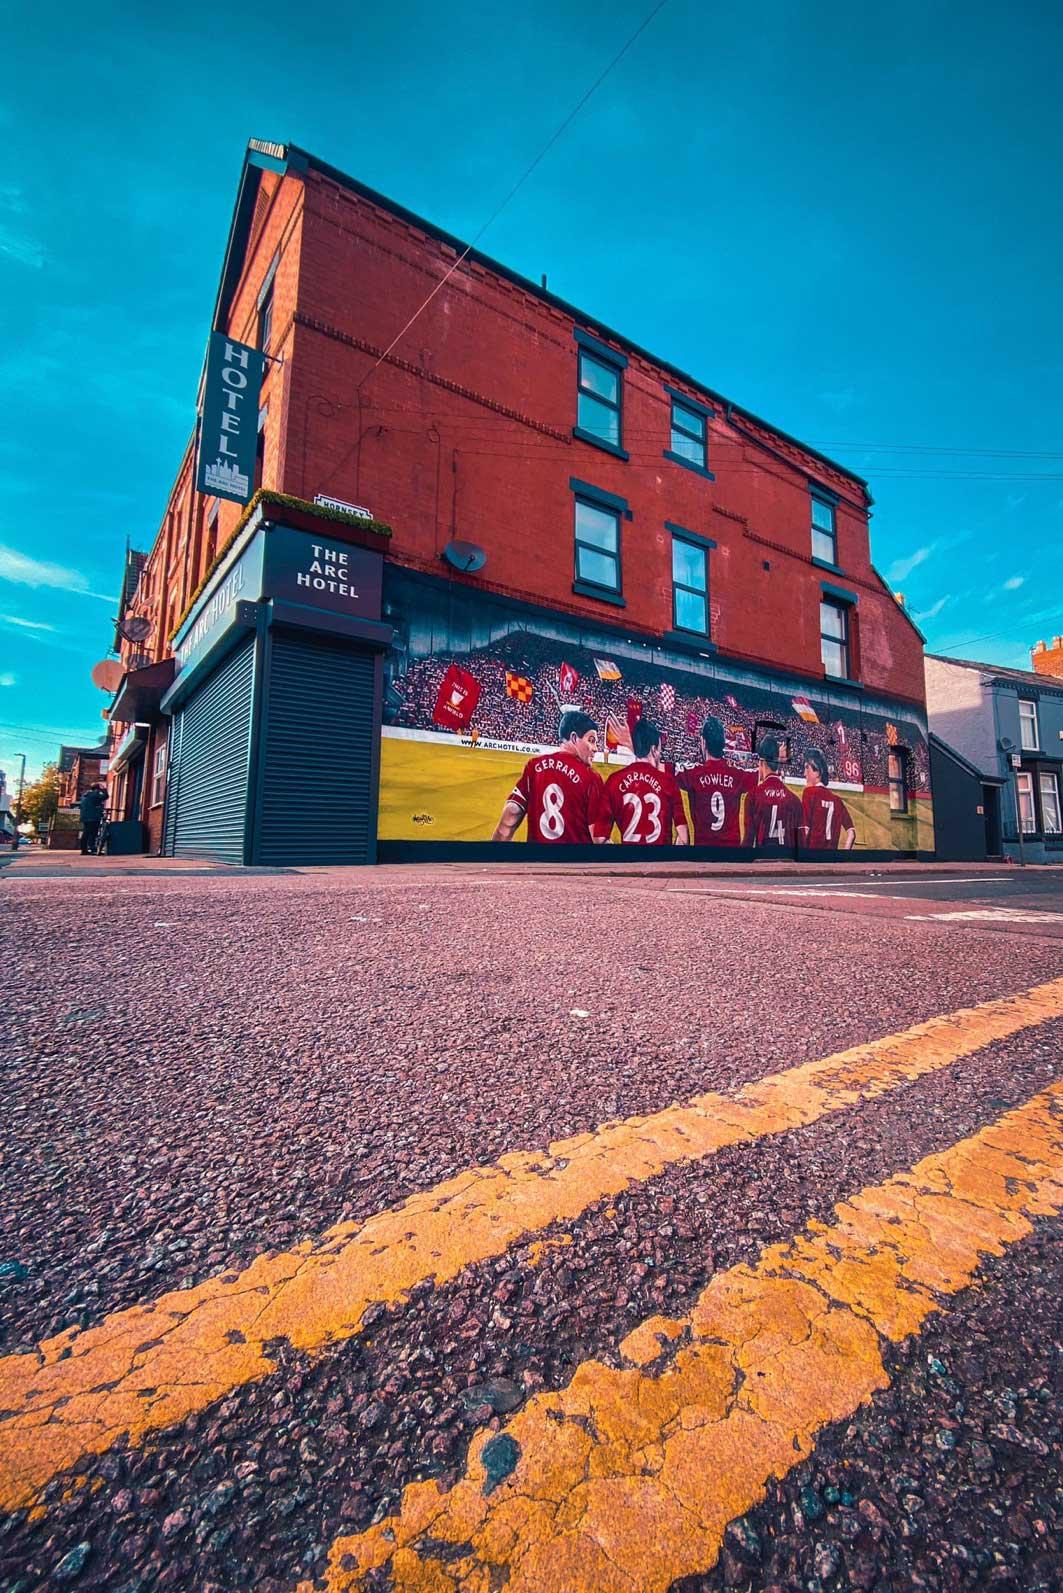 110-hotel-street-art-liverpoolfc